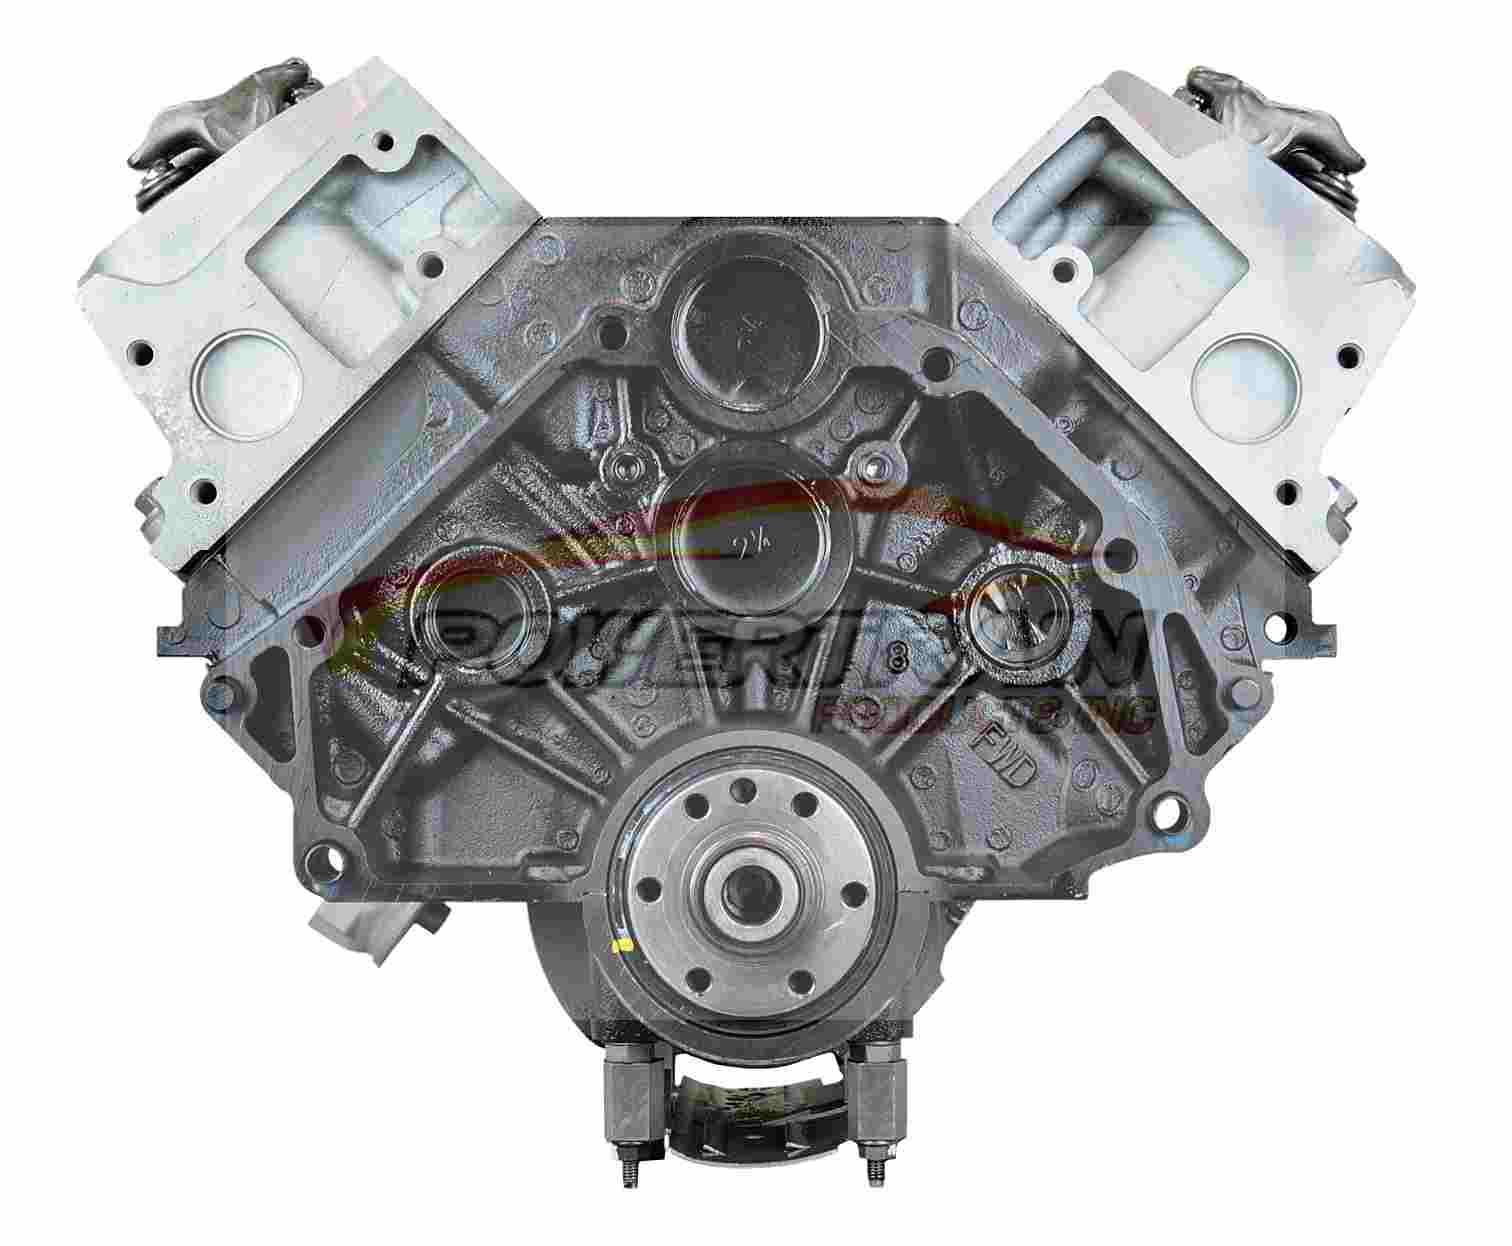 2000 ford windstar engine diagram ski doo snowmobile parts s3 amazonaws com powertrainproducts images waterma